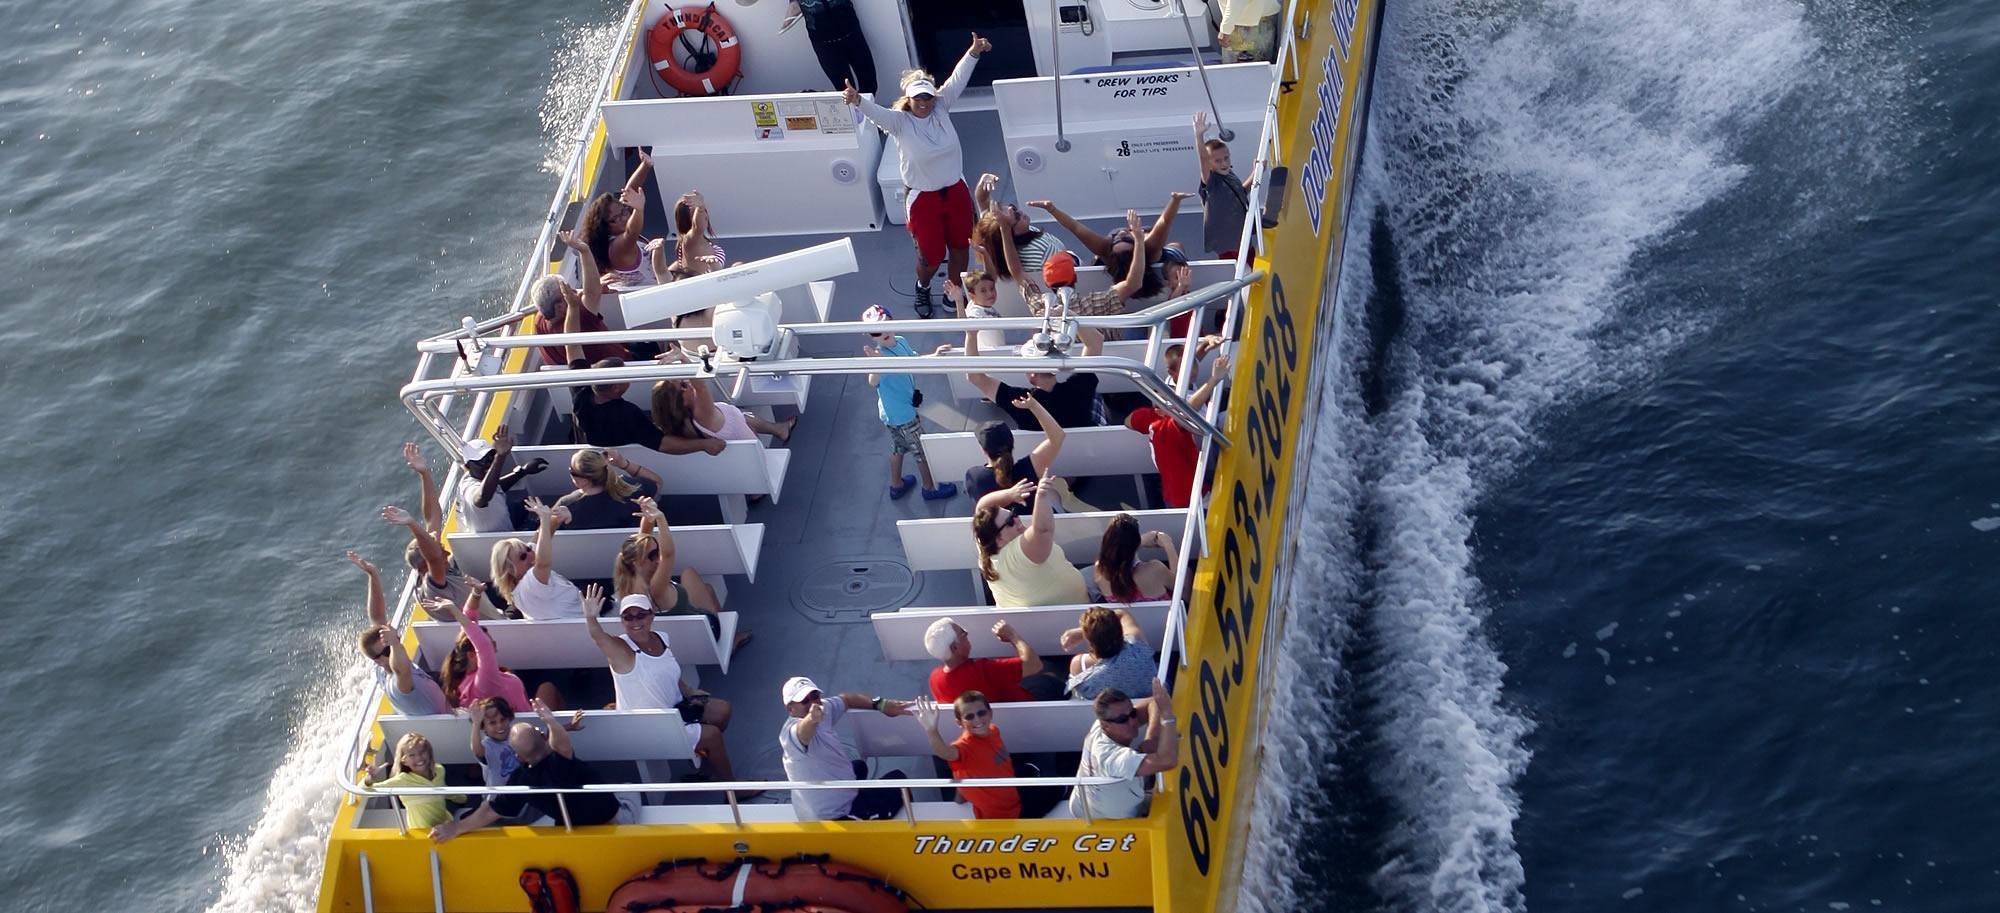 Thunder Cat Dolphin Watch Speedboat Tours Wildwood